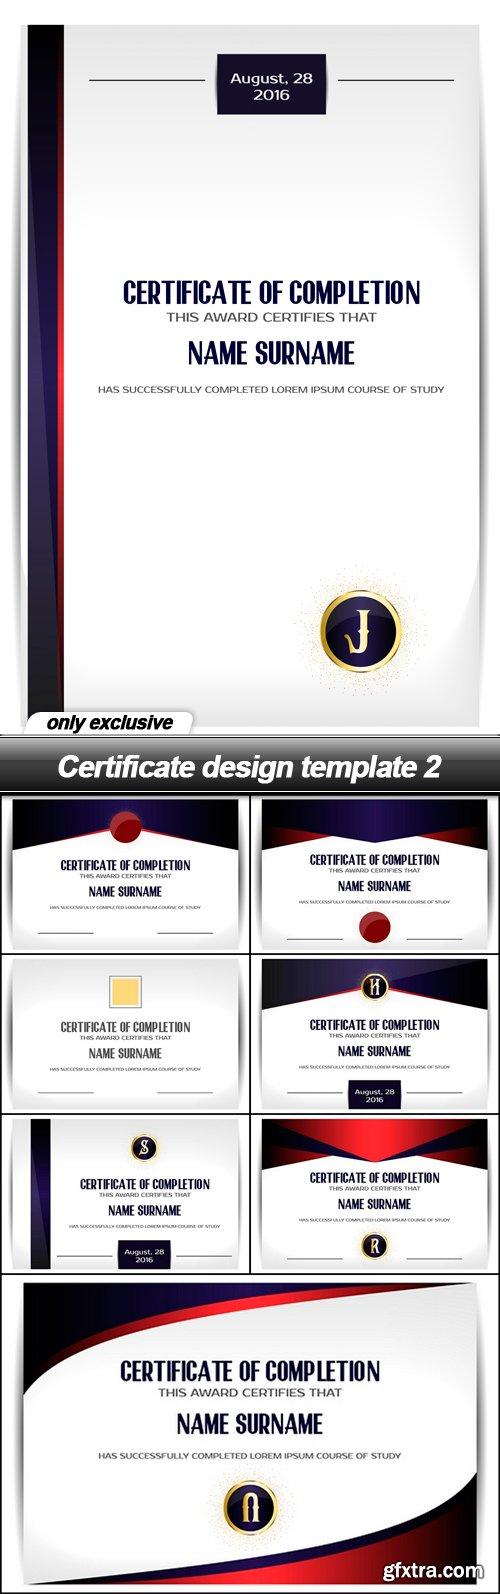 Certificate design template 2 - 8 EPS